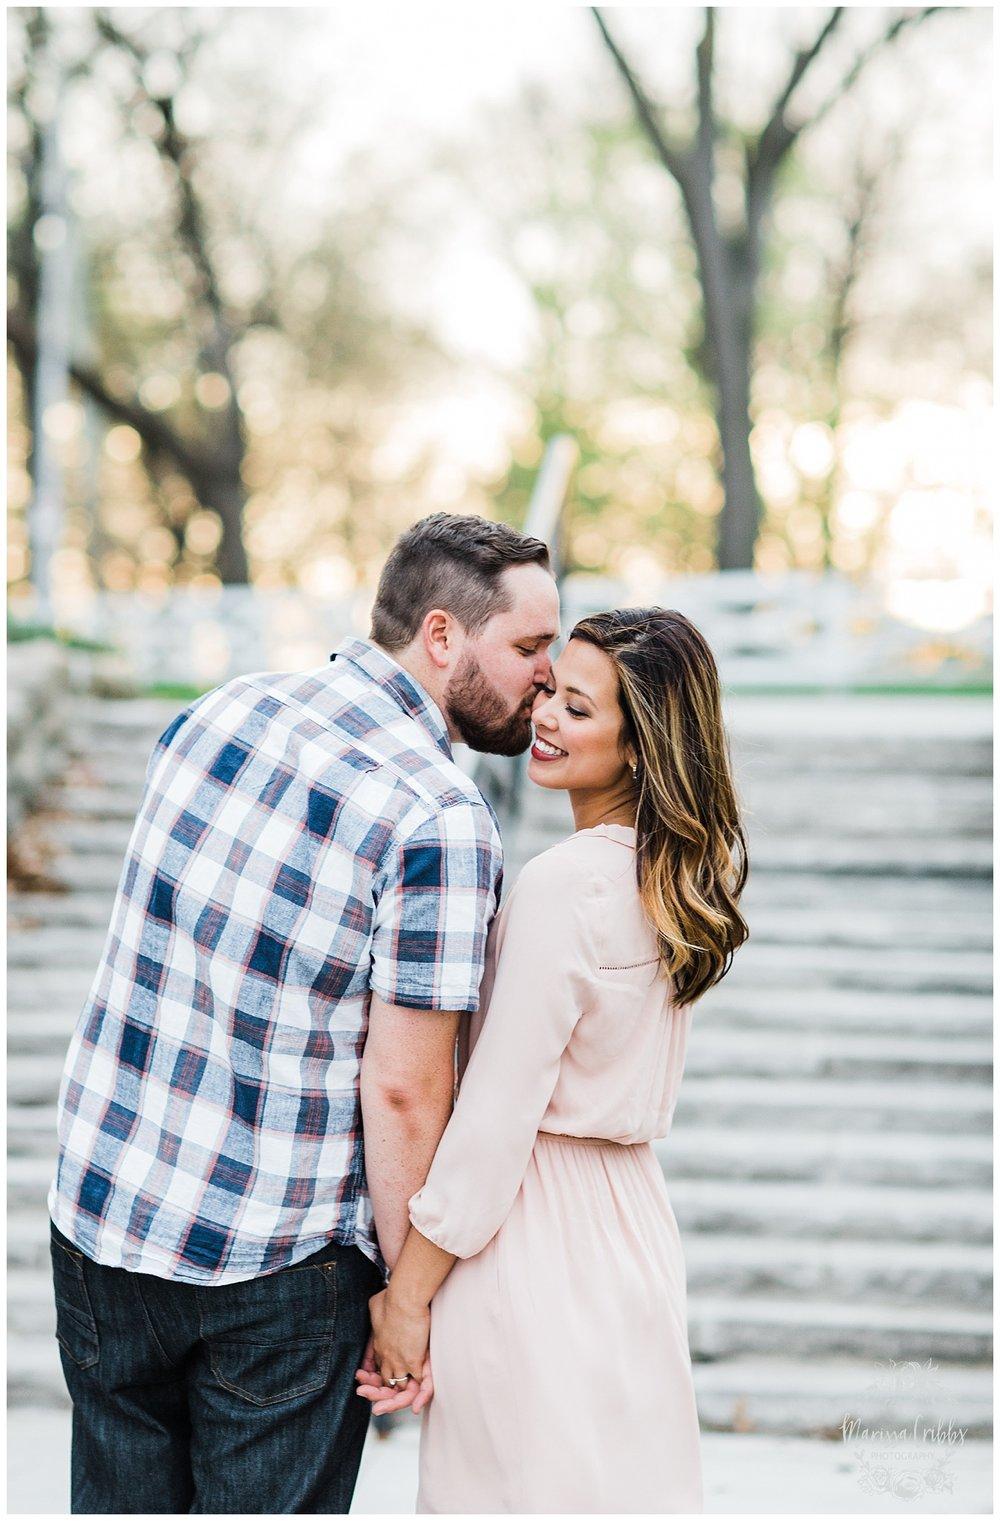 Leah & Michael Engagement | Loose Park Engagement Photos | KC Photographers | Marissa Cribbs Photography | KC Wedding Photographers_0816.jpg